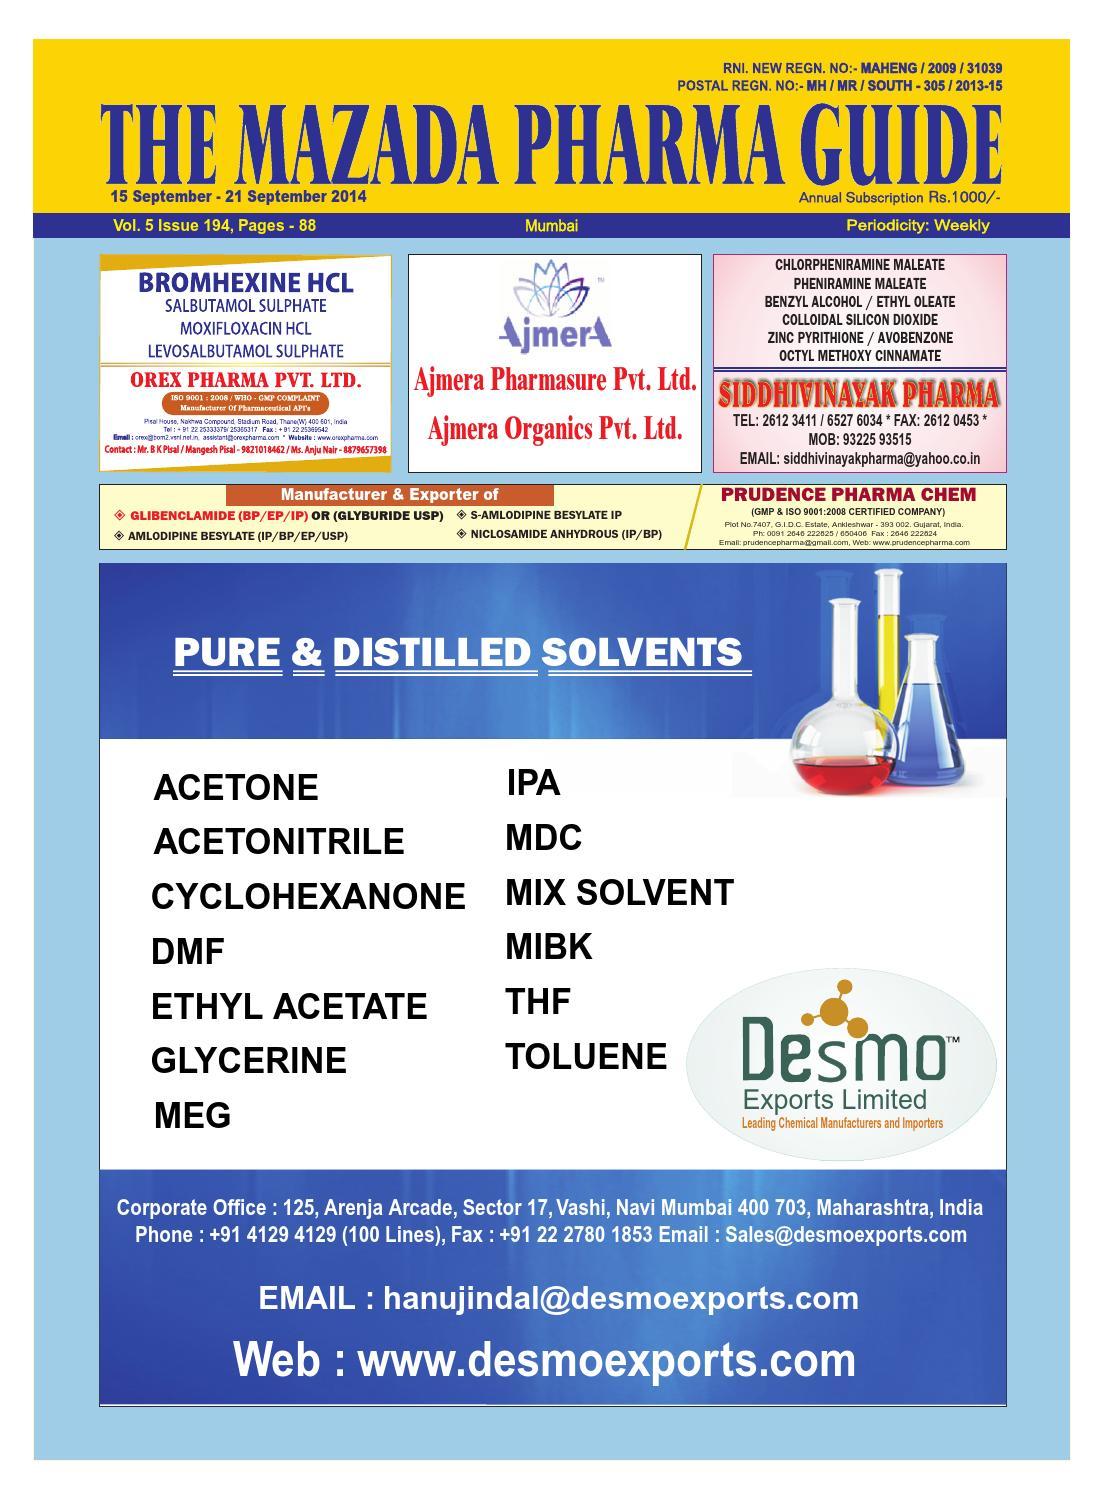 The Mazada Pharma Guide 15th Sep 21th Sep 2014 by The Mazada Pharma